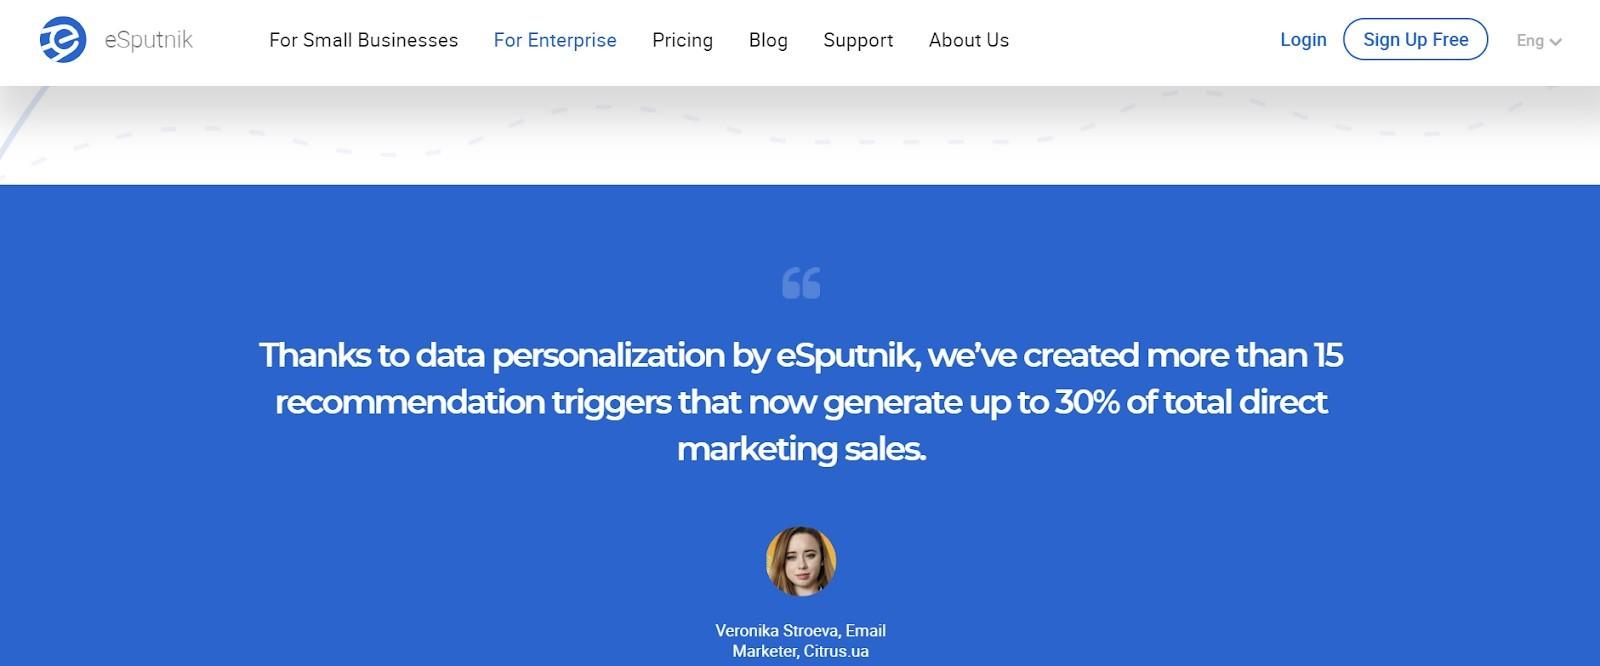 Landing page example by eSputnik